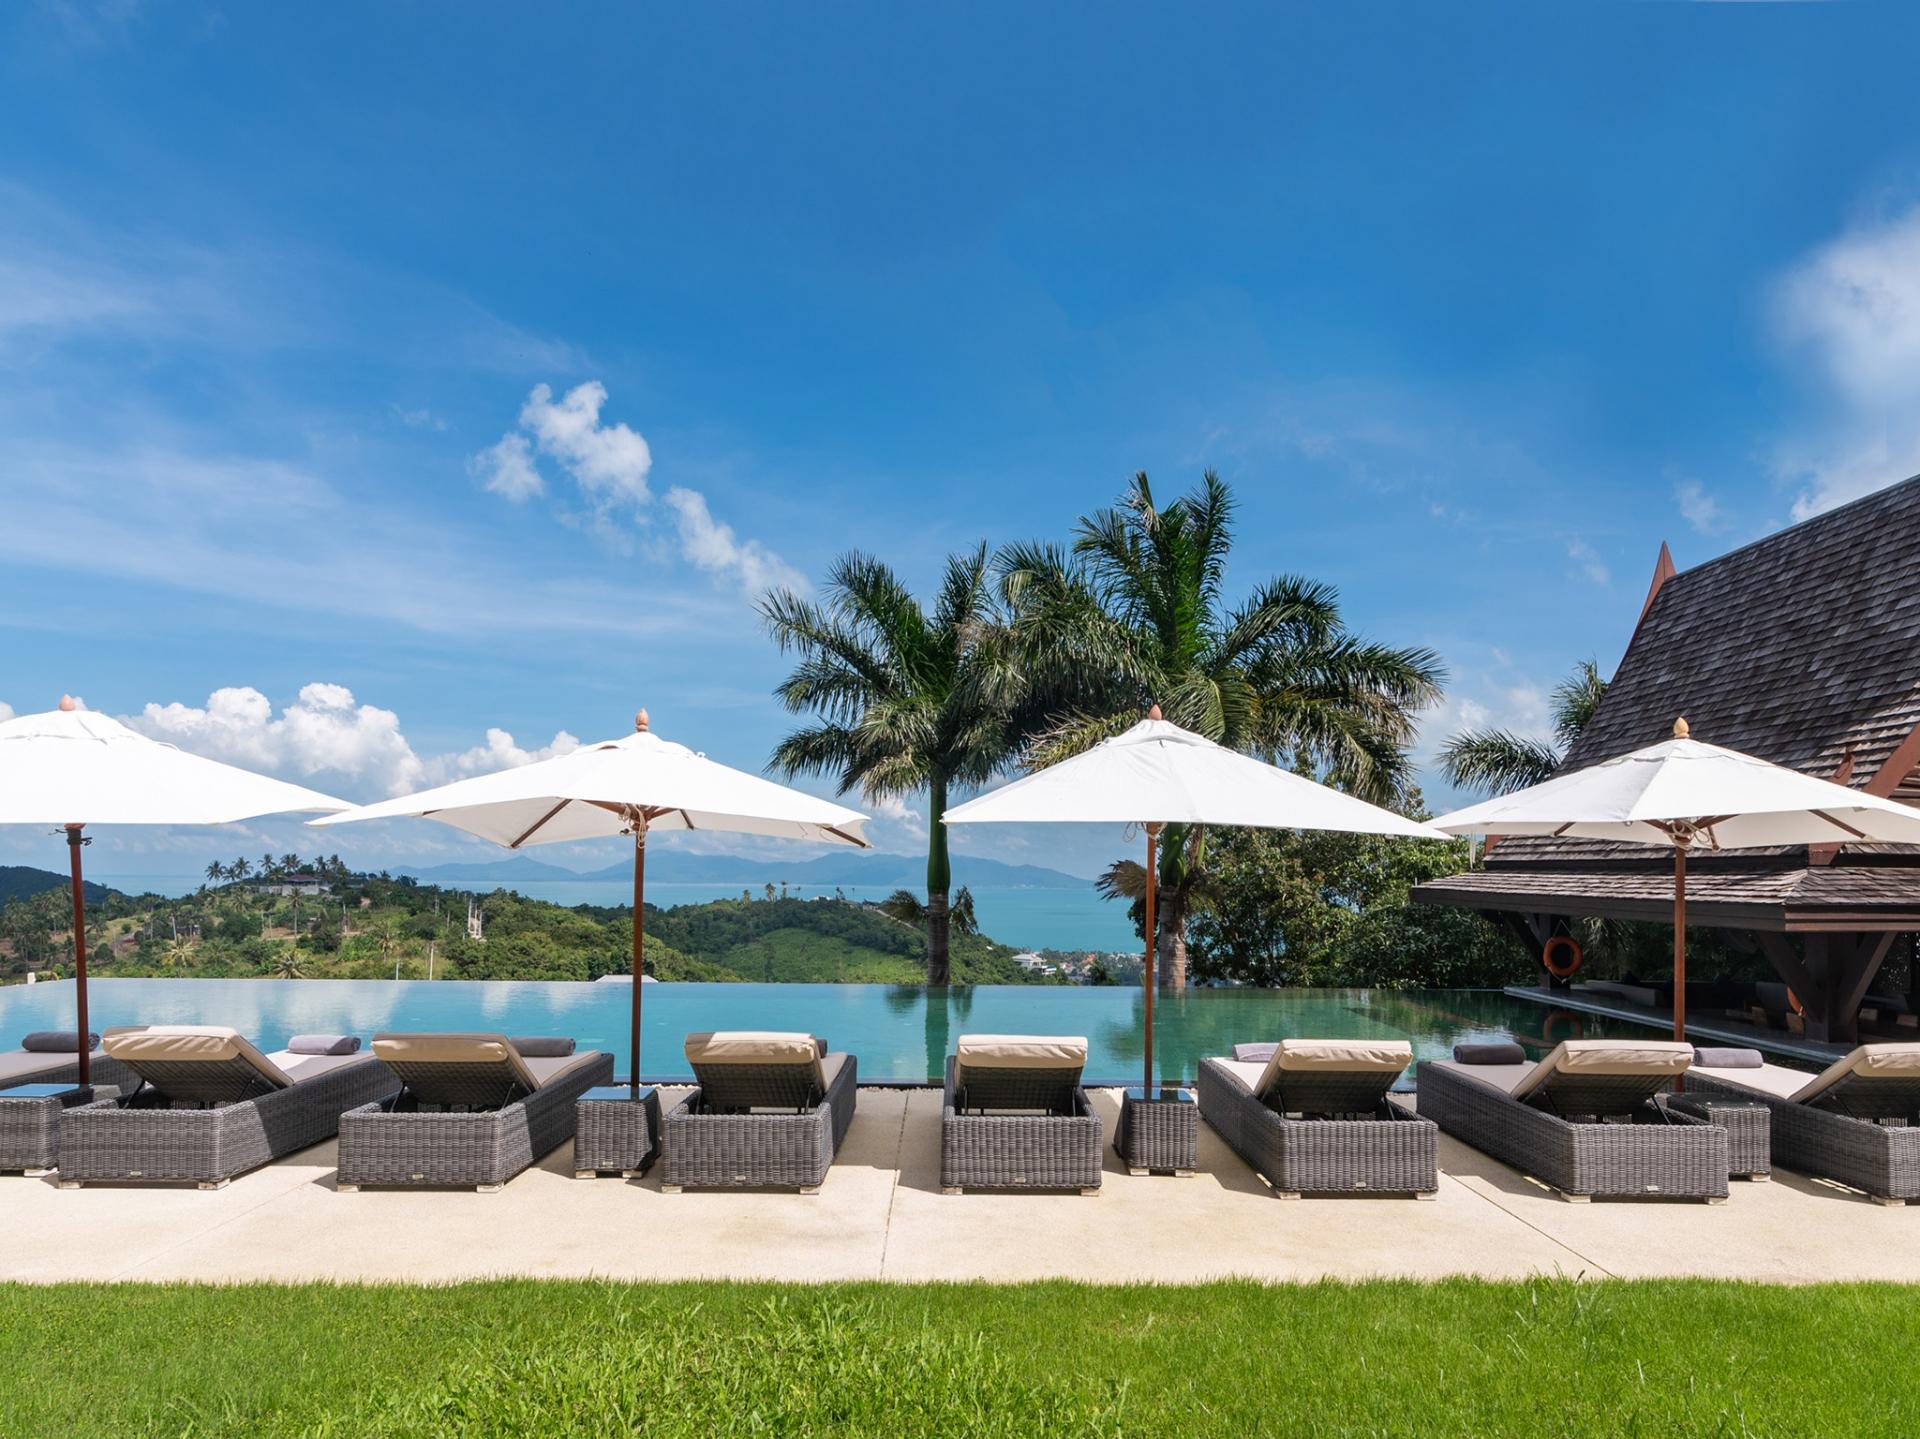 Breathtaking Family Villa-017 Villa Suralai - Relax and relish.jpg